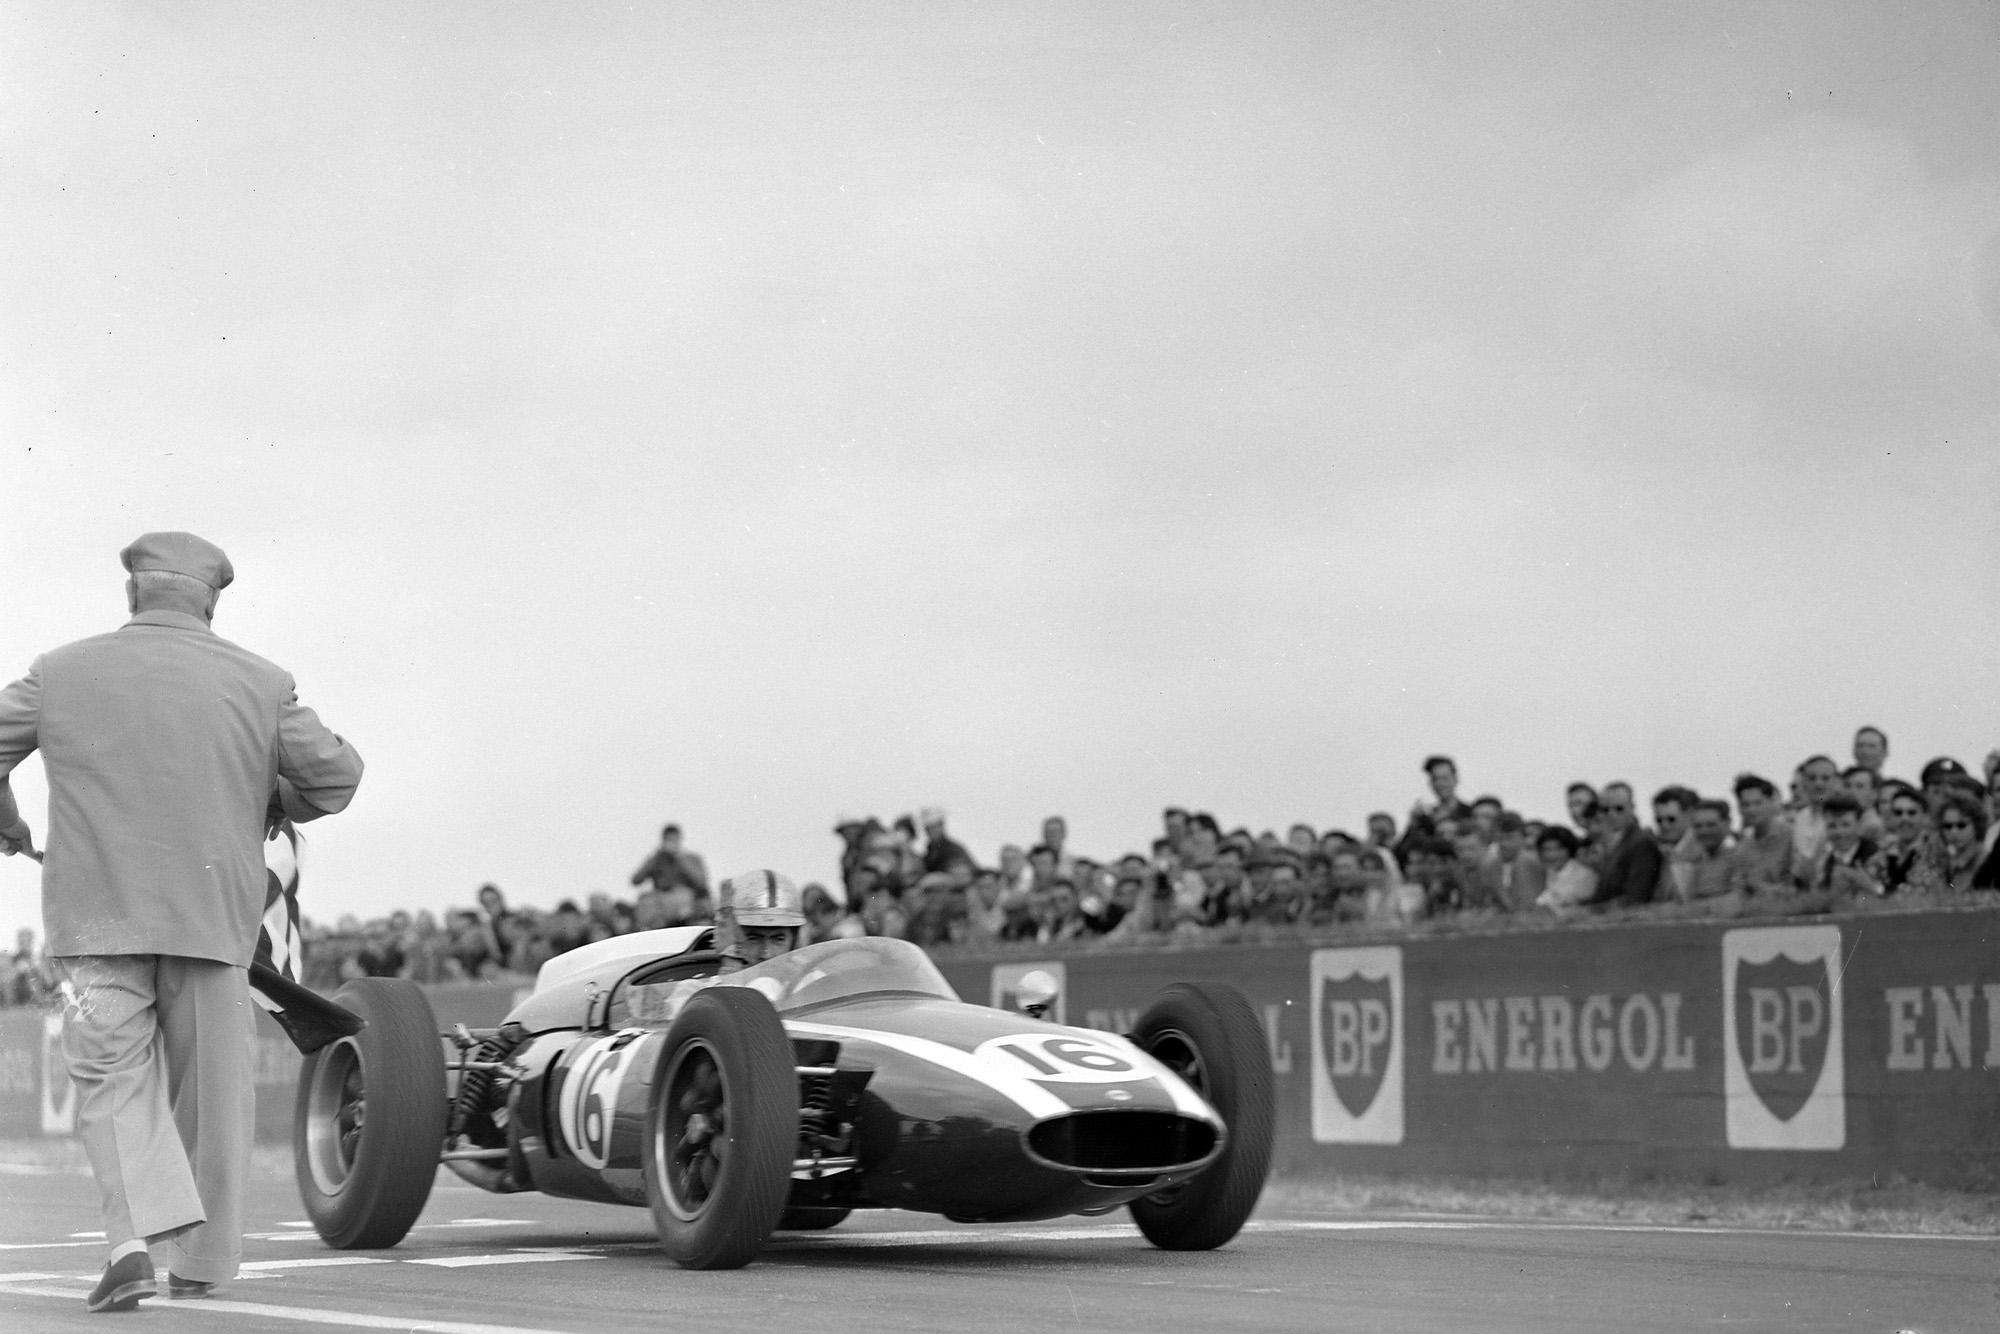 Jack Brabham takes his 3rd win of the season